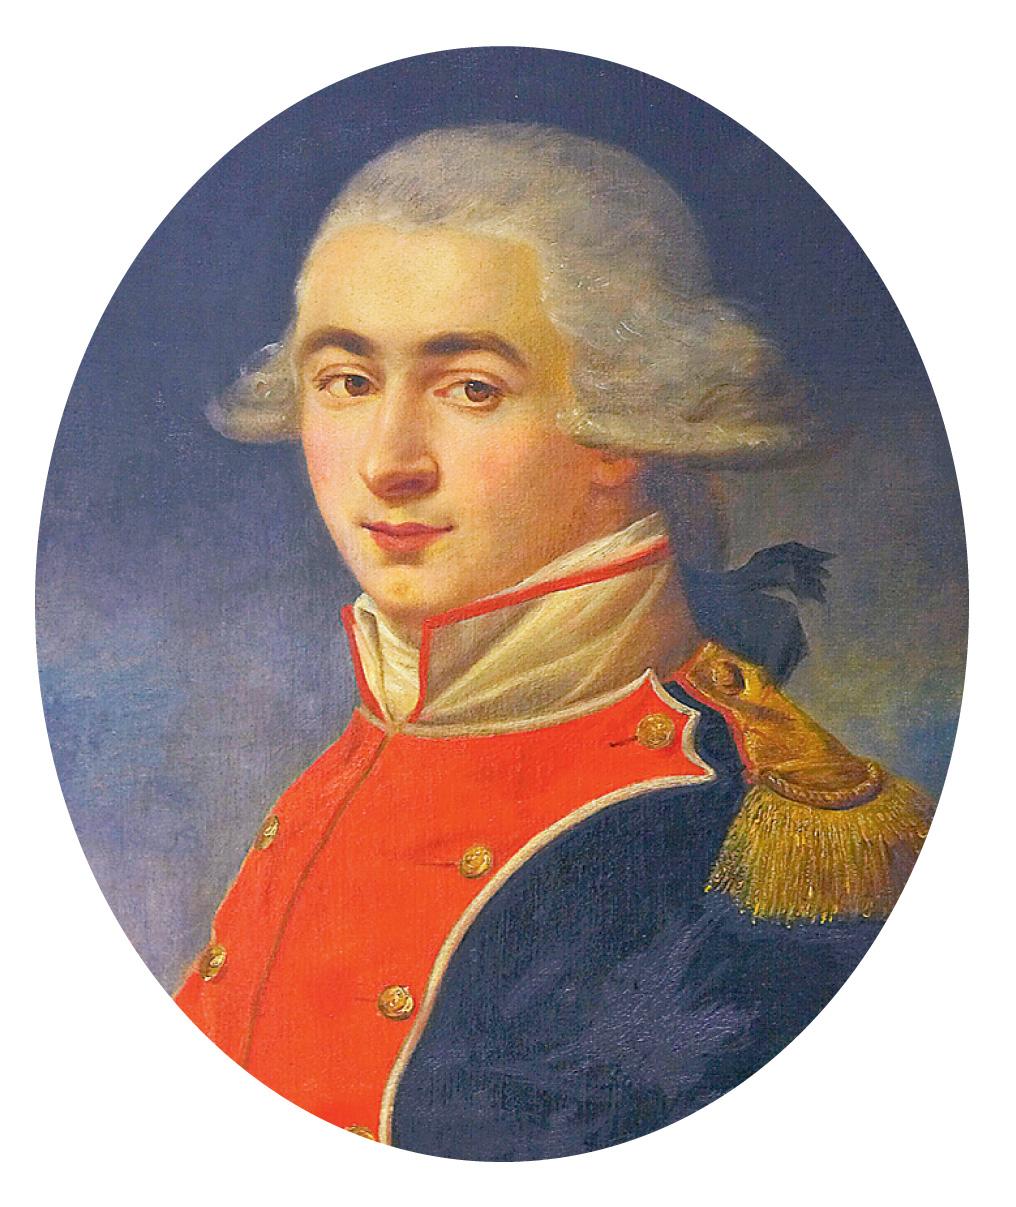 General Marquis de Lafayette - American Revolution for Kids